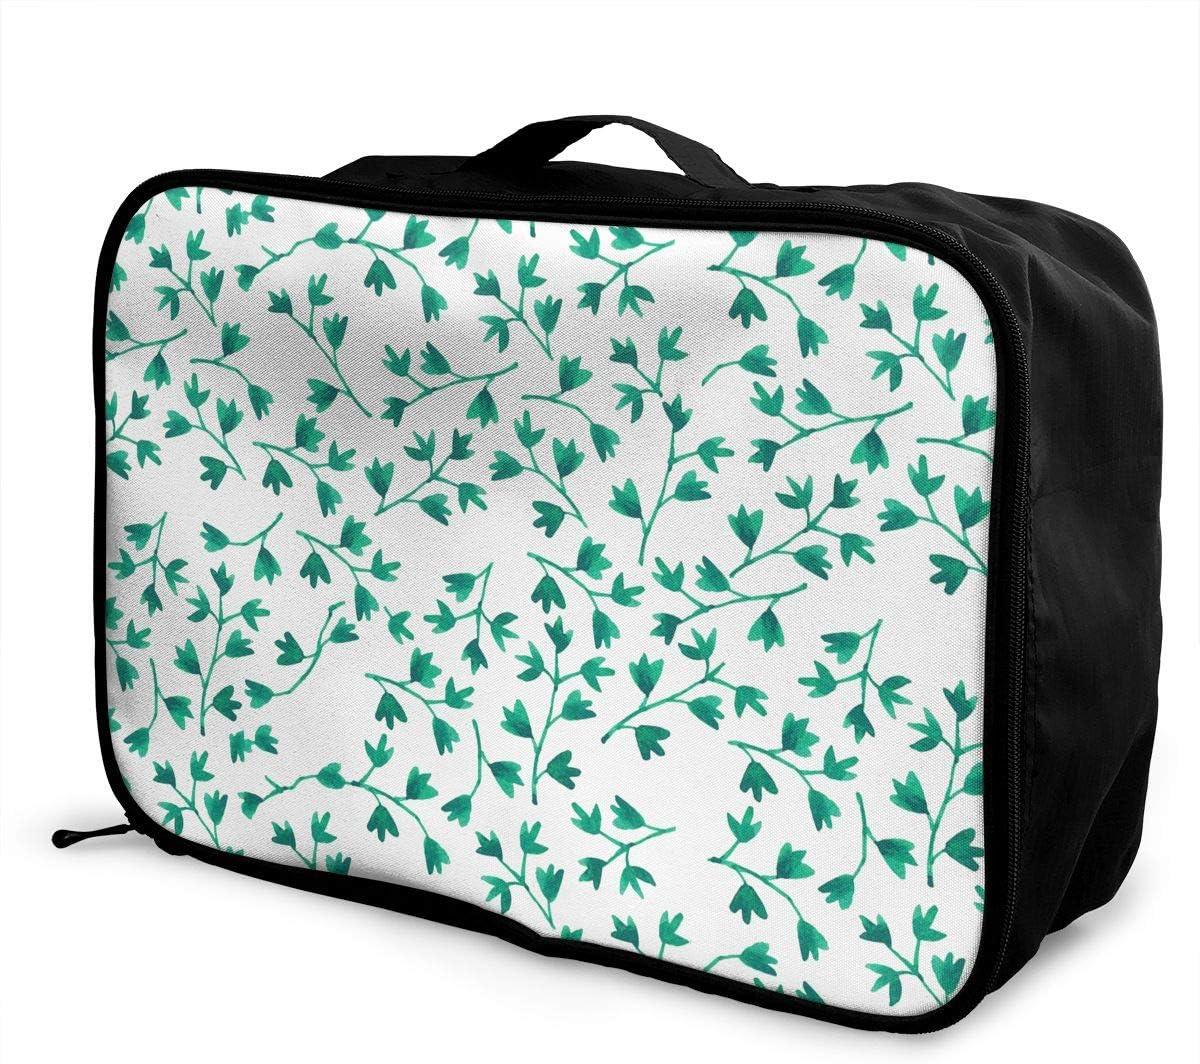 Green Leaf Travel Carry-on Luggage Weekender Bag Overnight Tote Flight Duffel In Trolley Handle